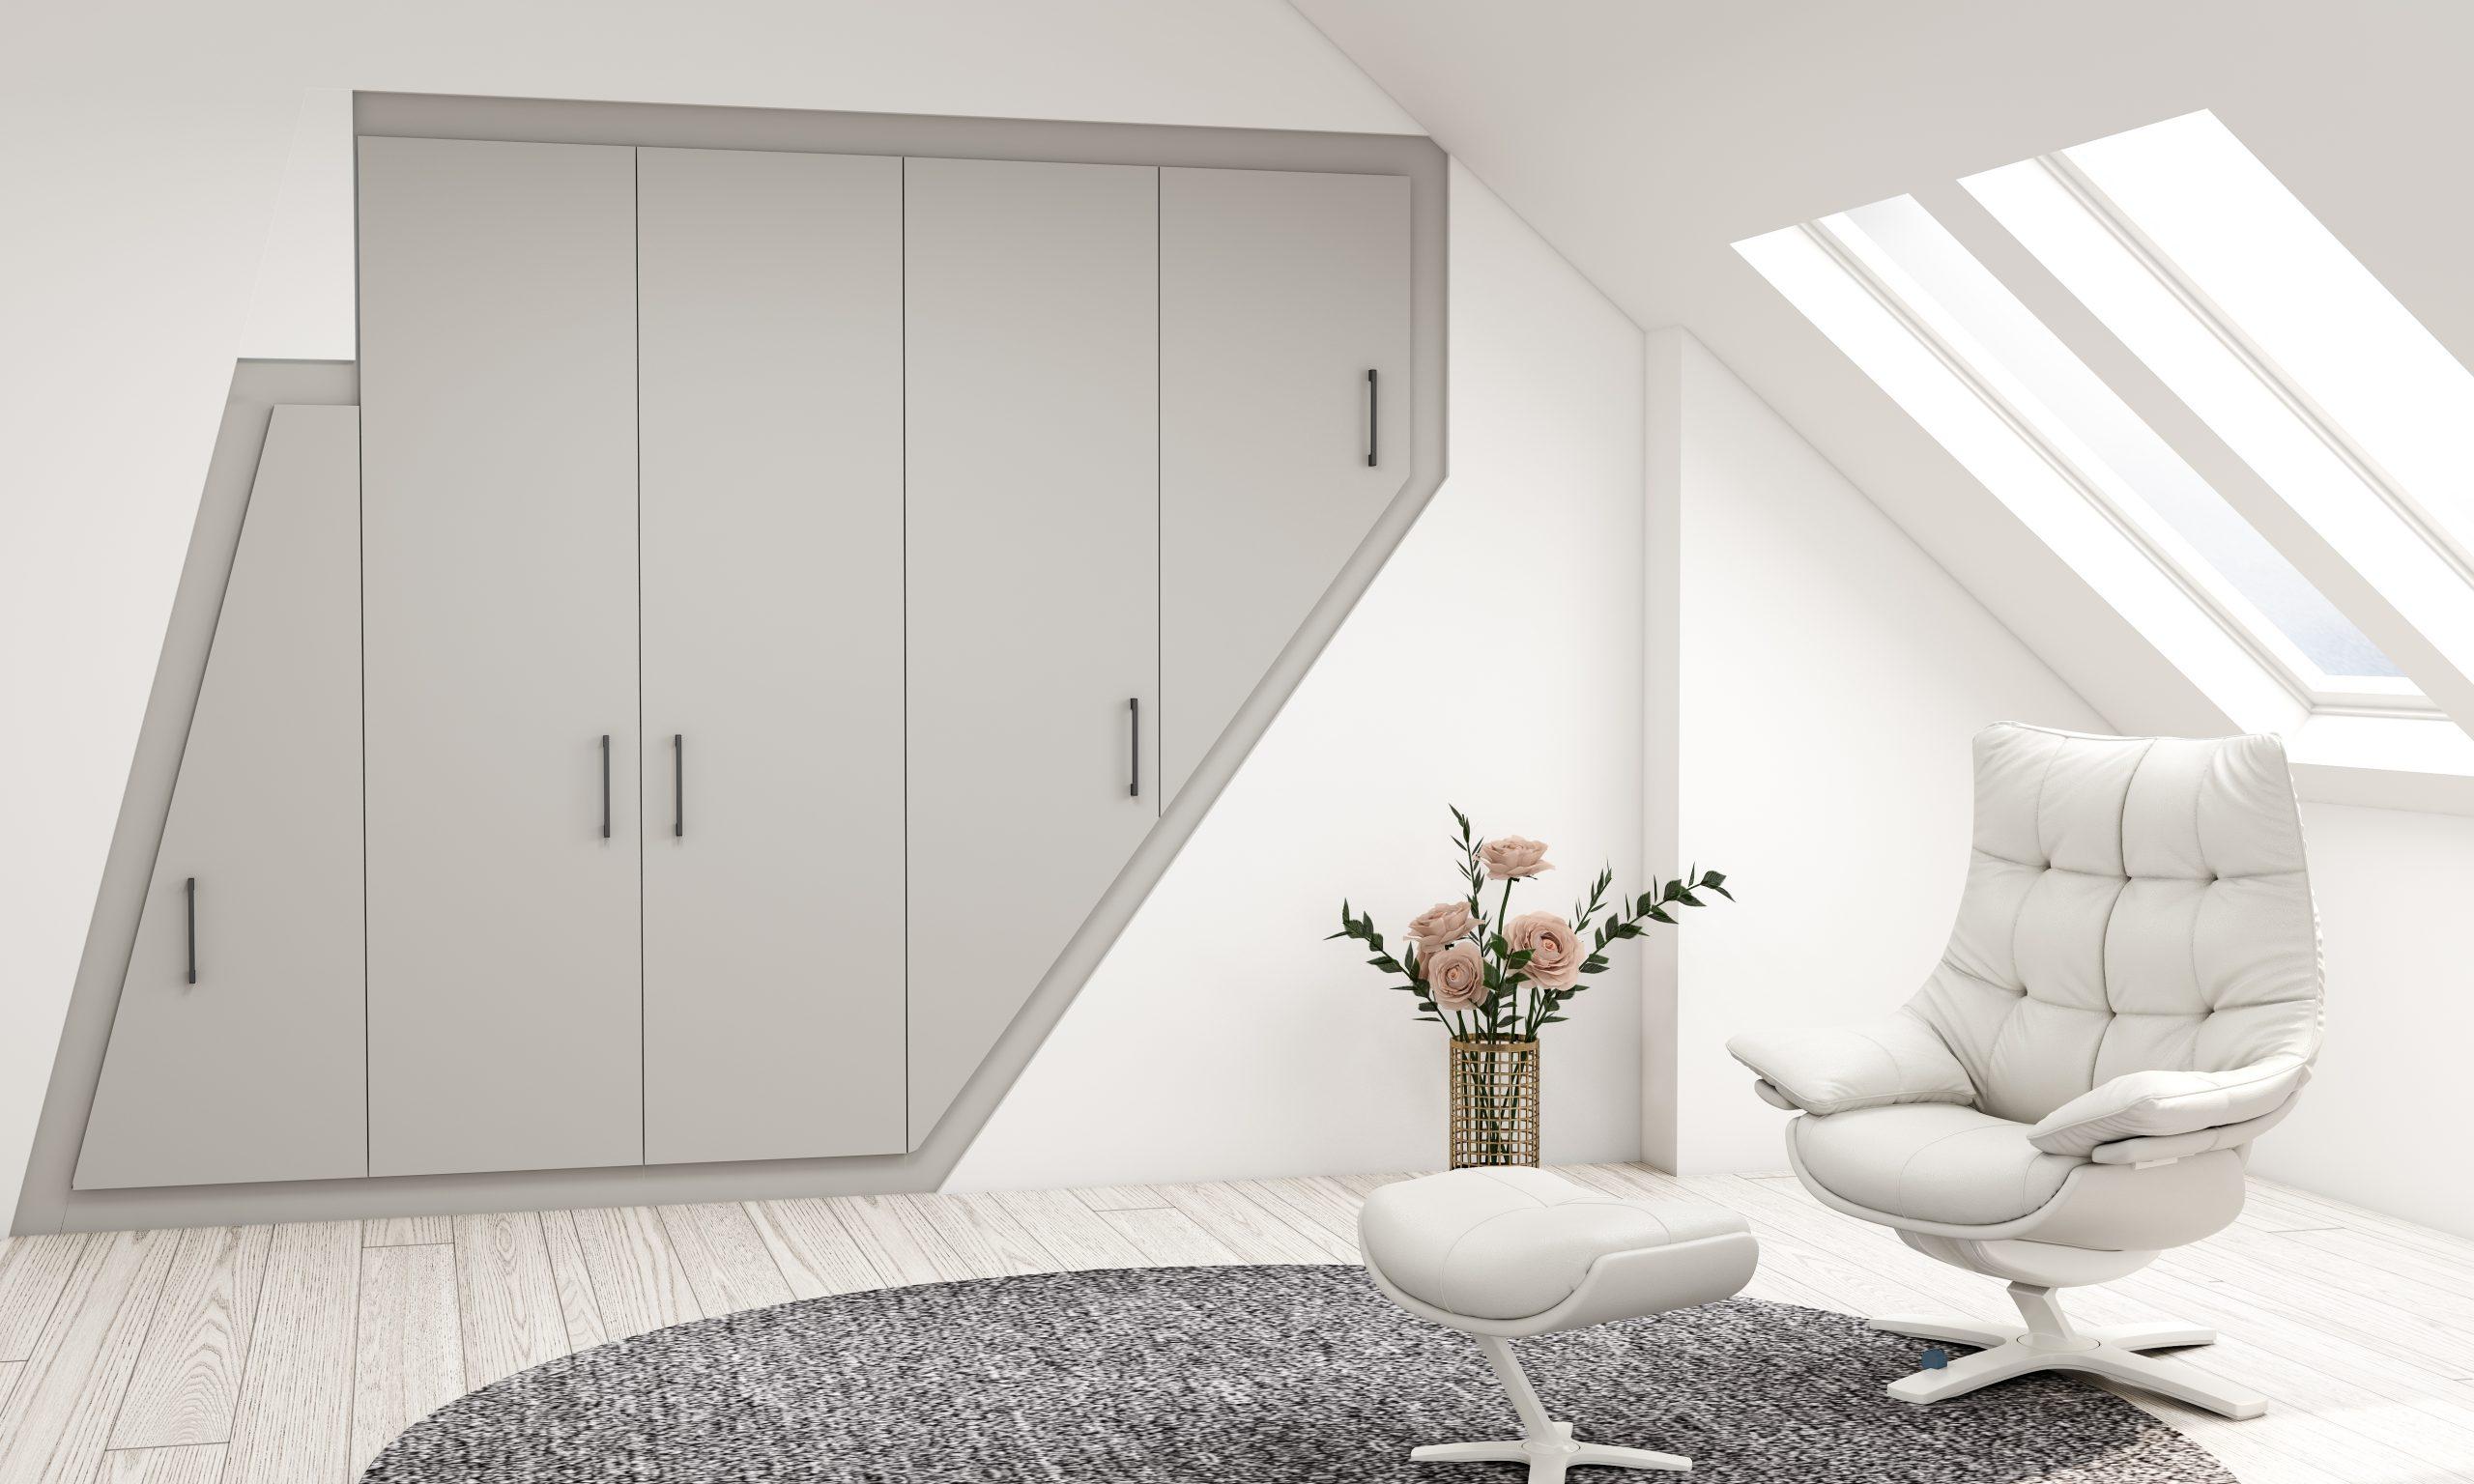 Bespoke loft attic wardrobe storage in light grey pearl finish